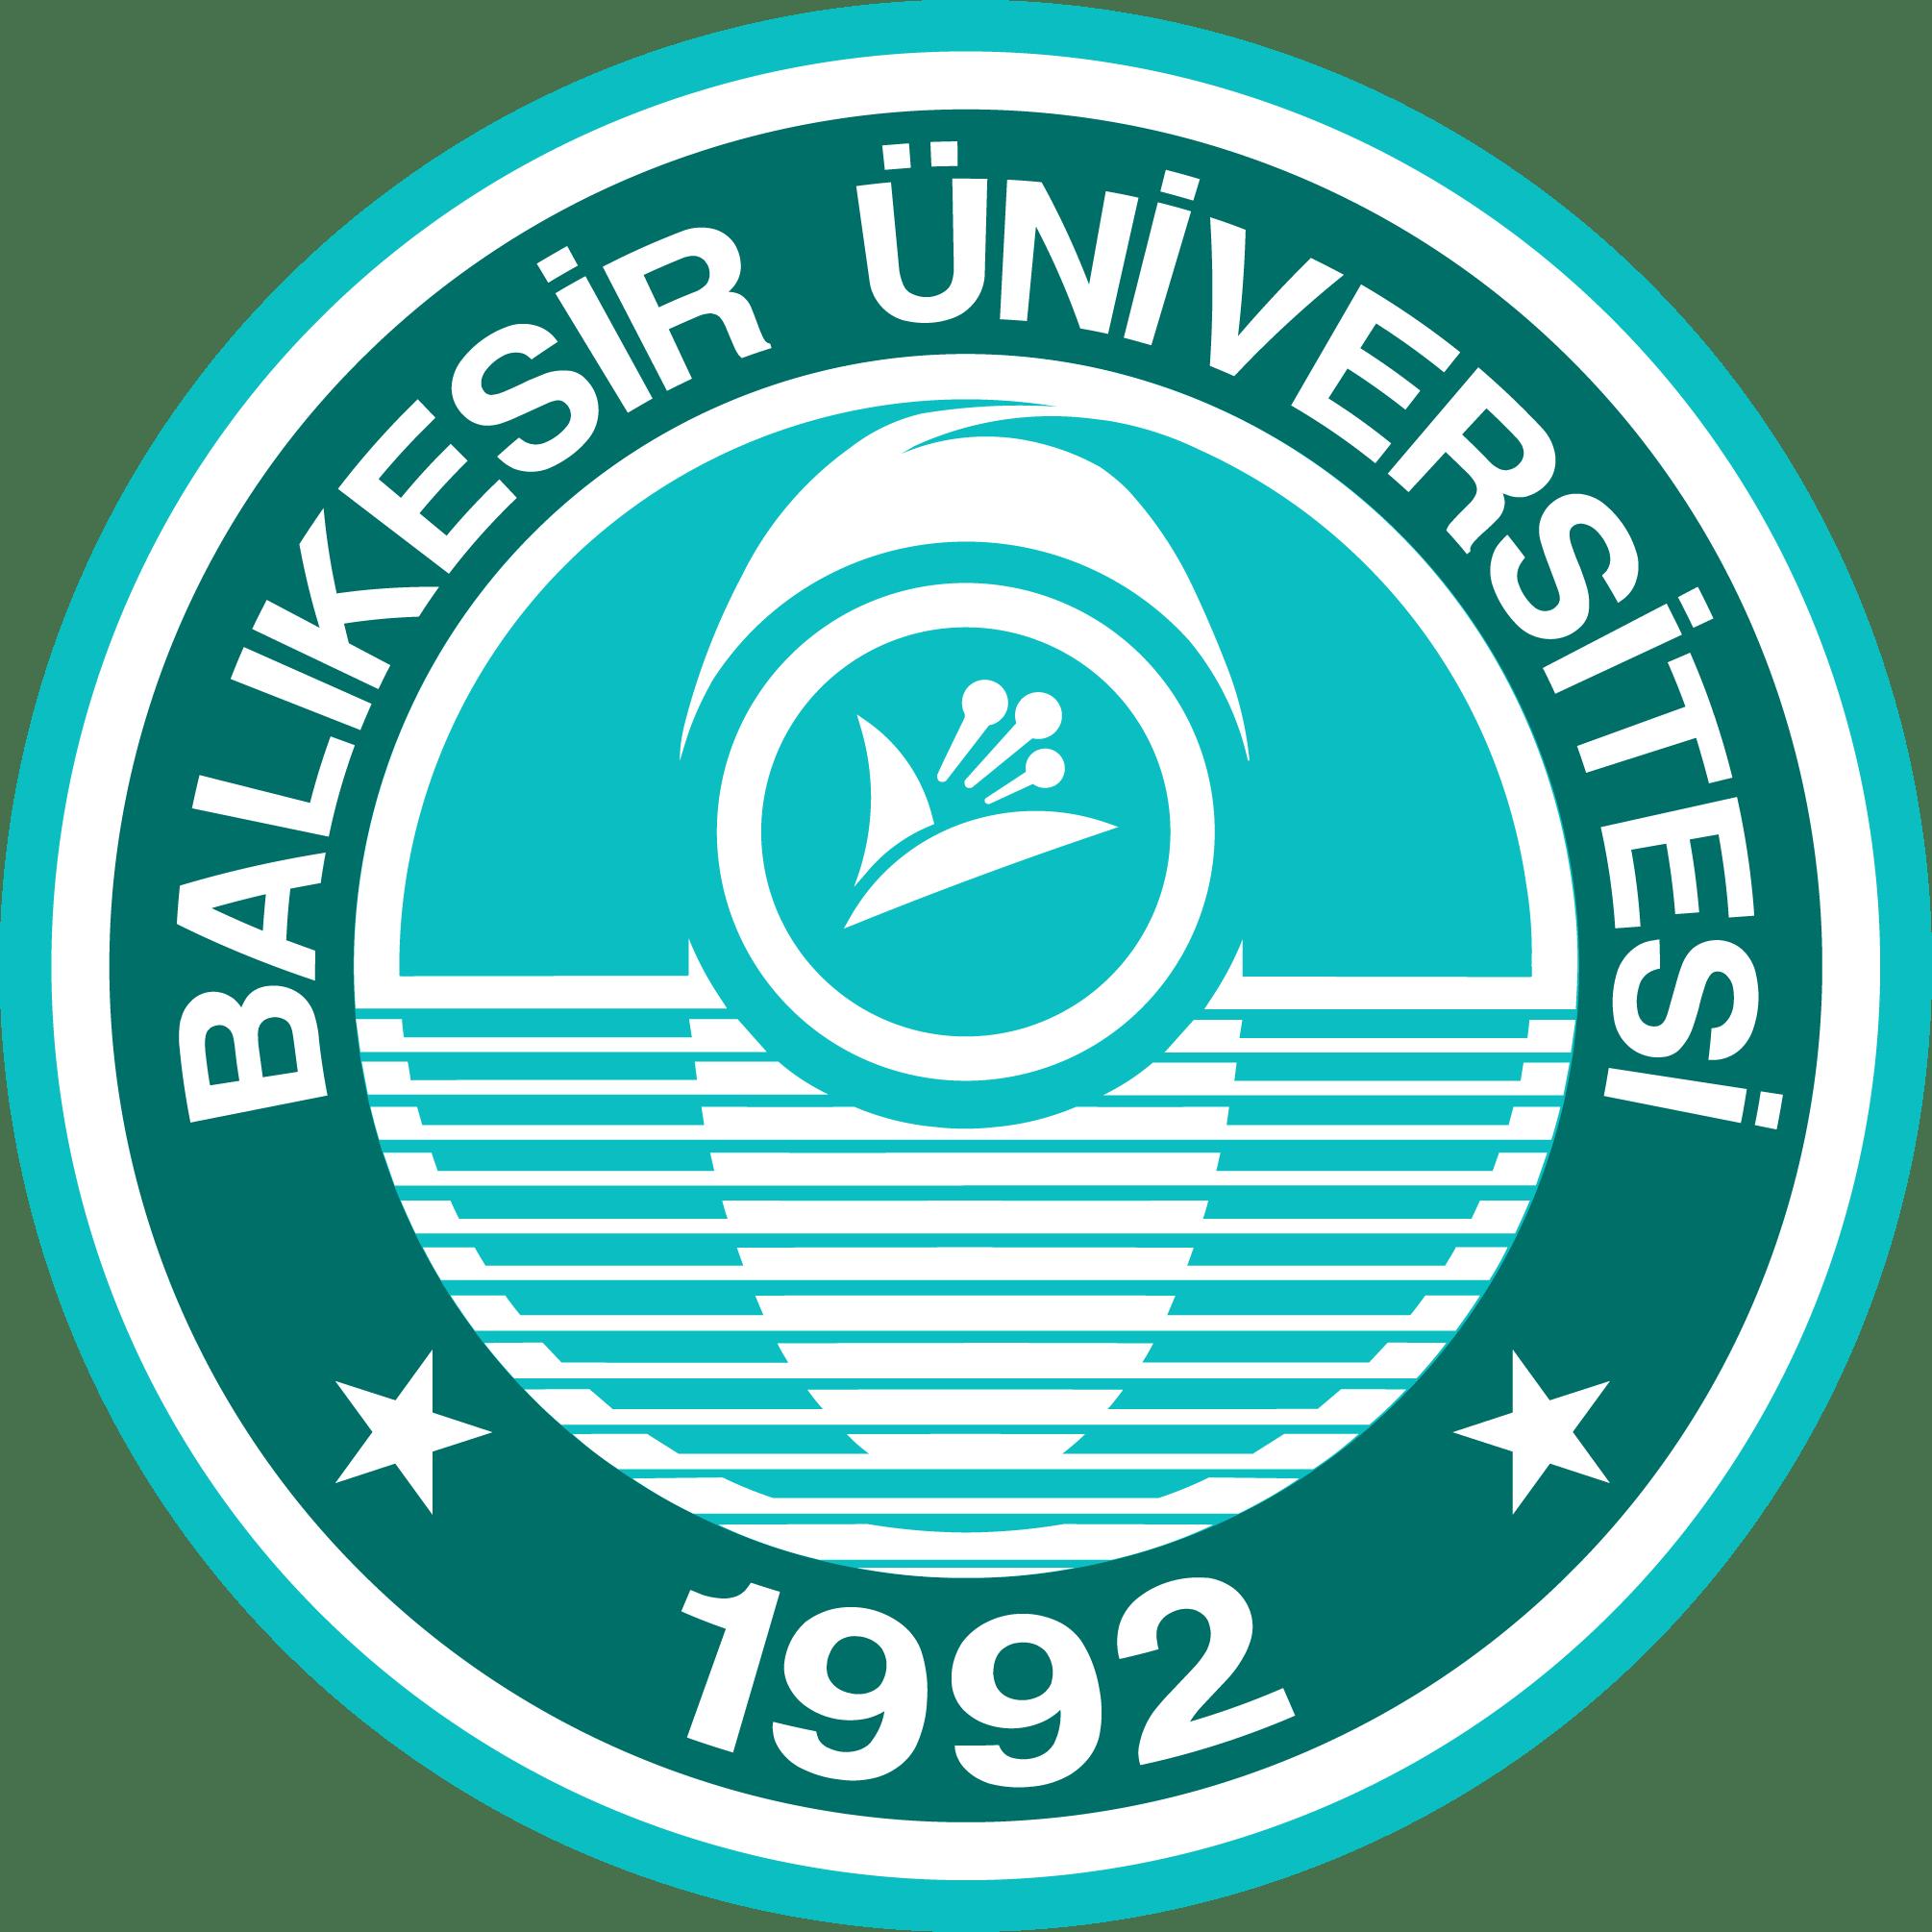 Balıkesir Üniversitesi Logo   Amblem png